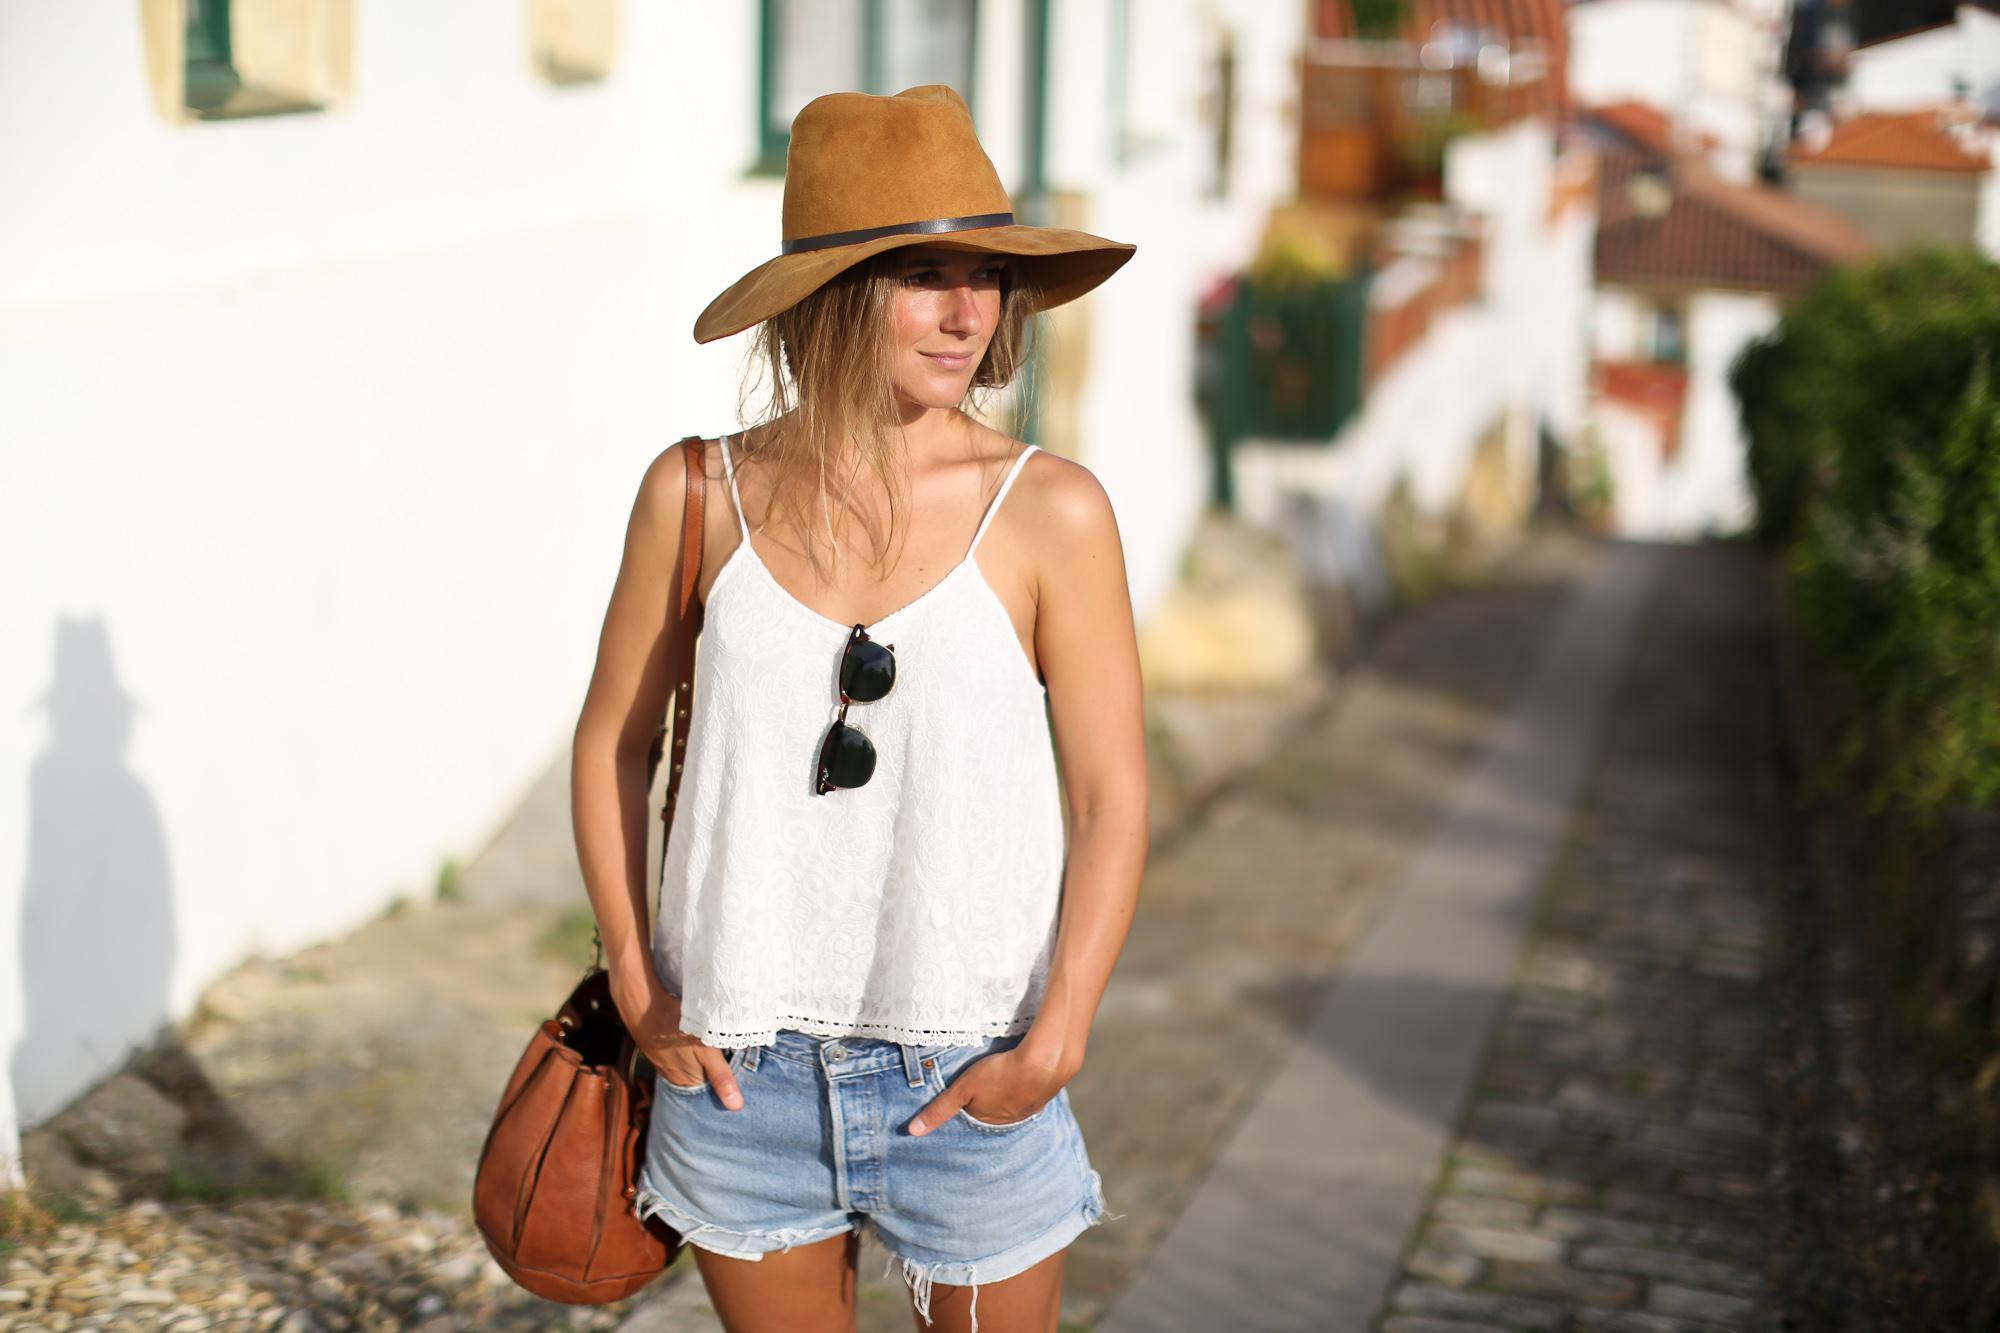 Clochet_streetstyle_levis_501_vintage_shorts_leather_fedora_hat